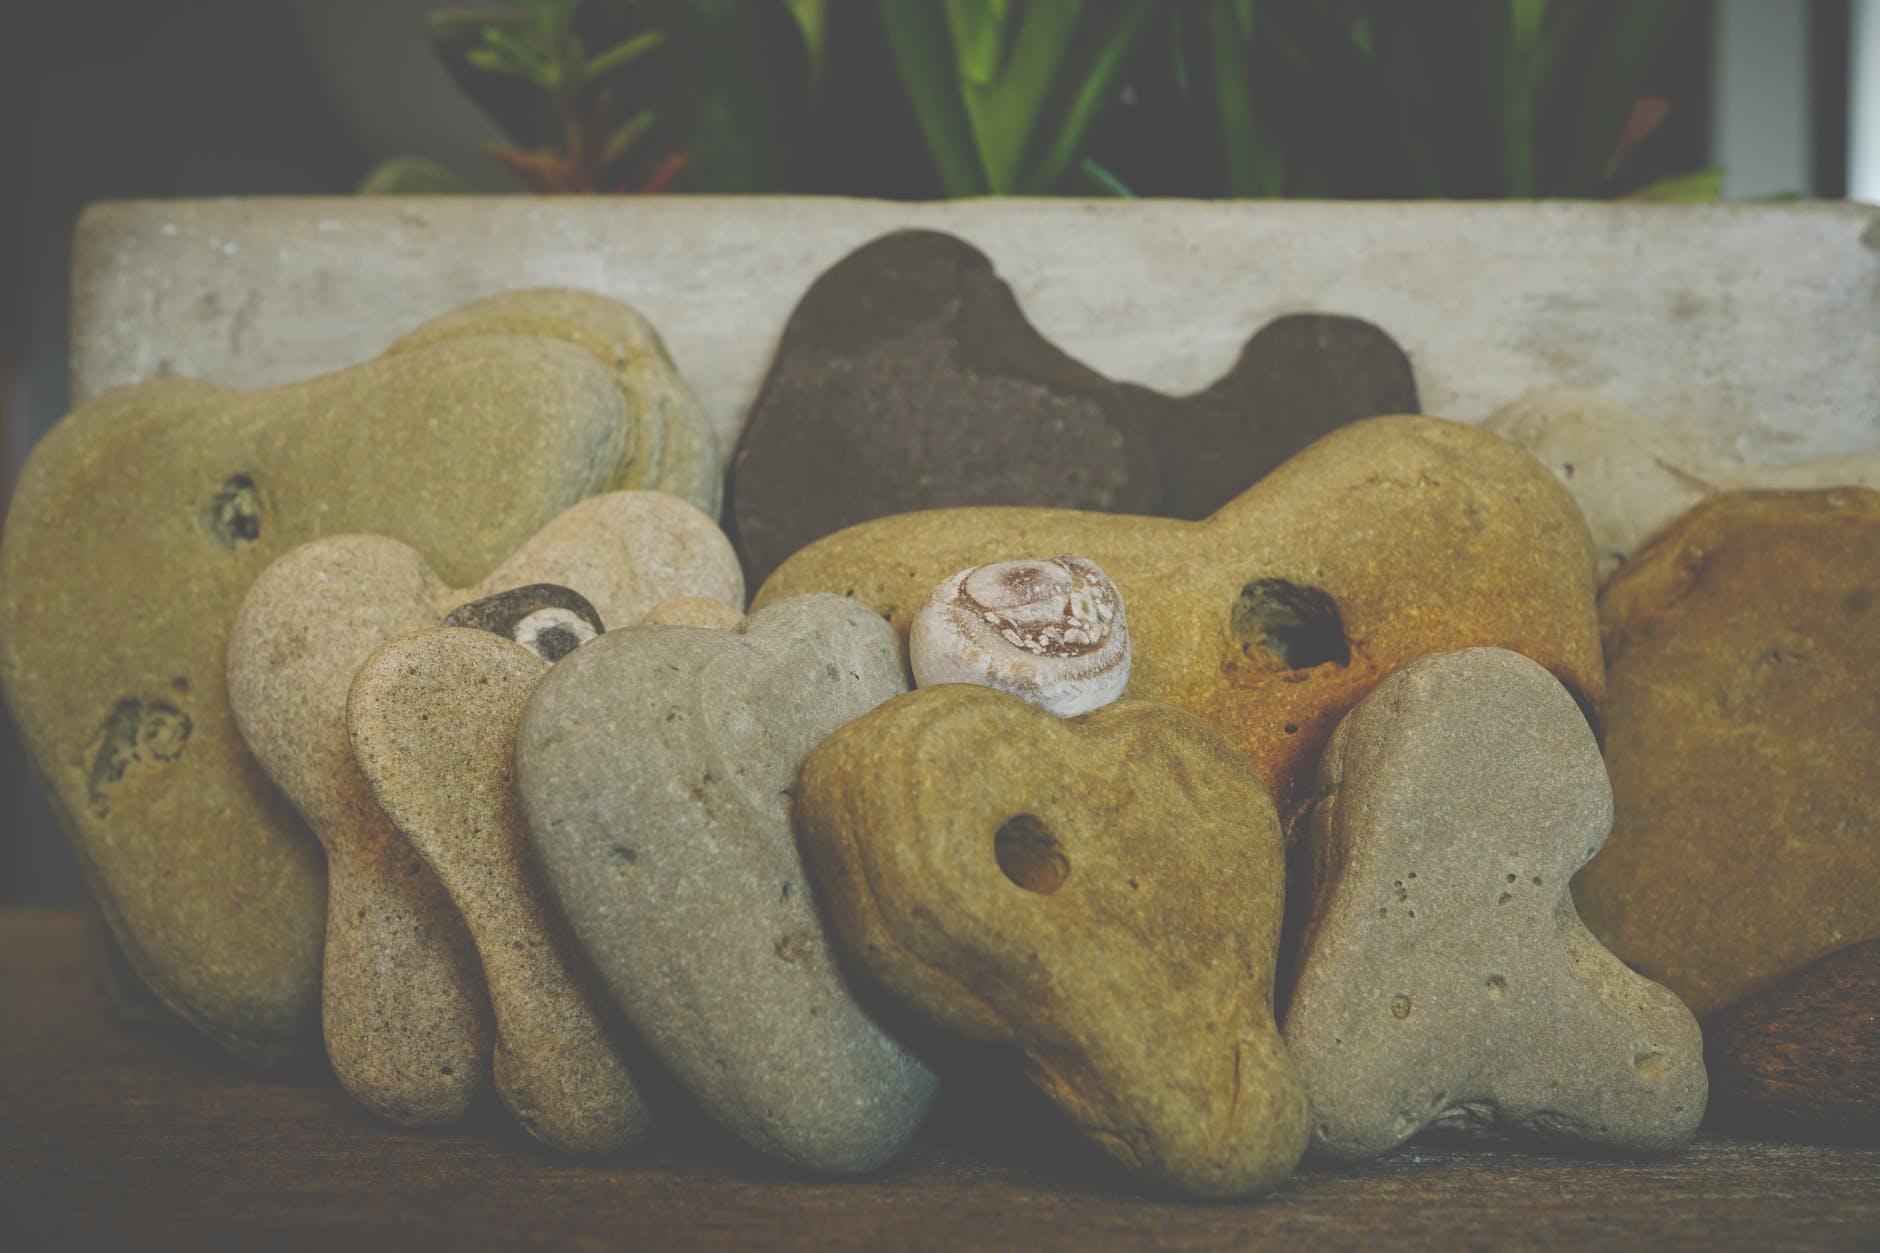 close up photo of arranged stones